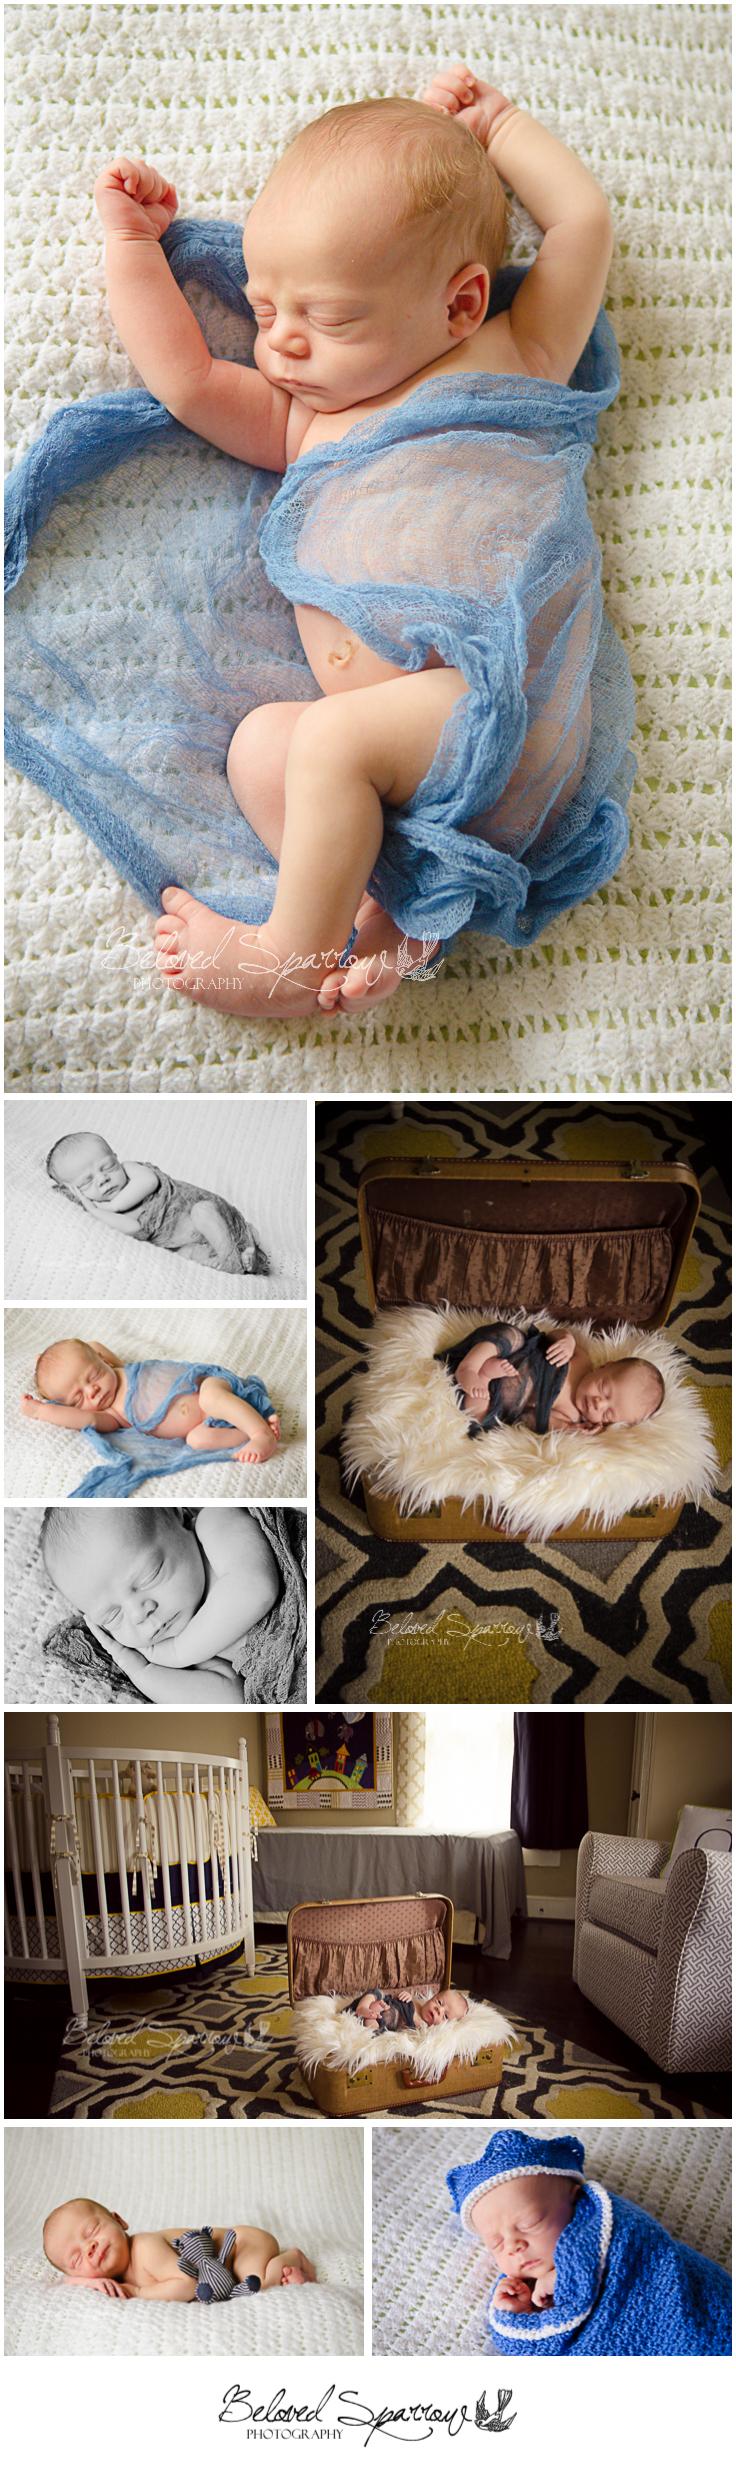 Peachtree City Newborn Photographer